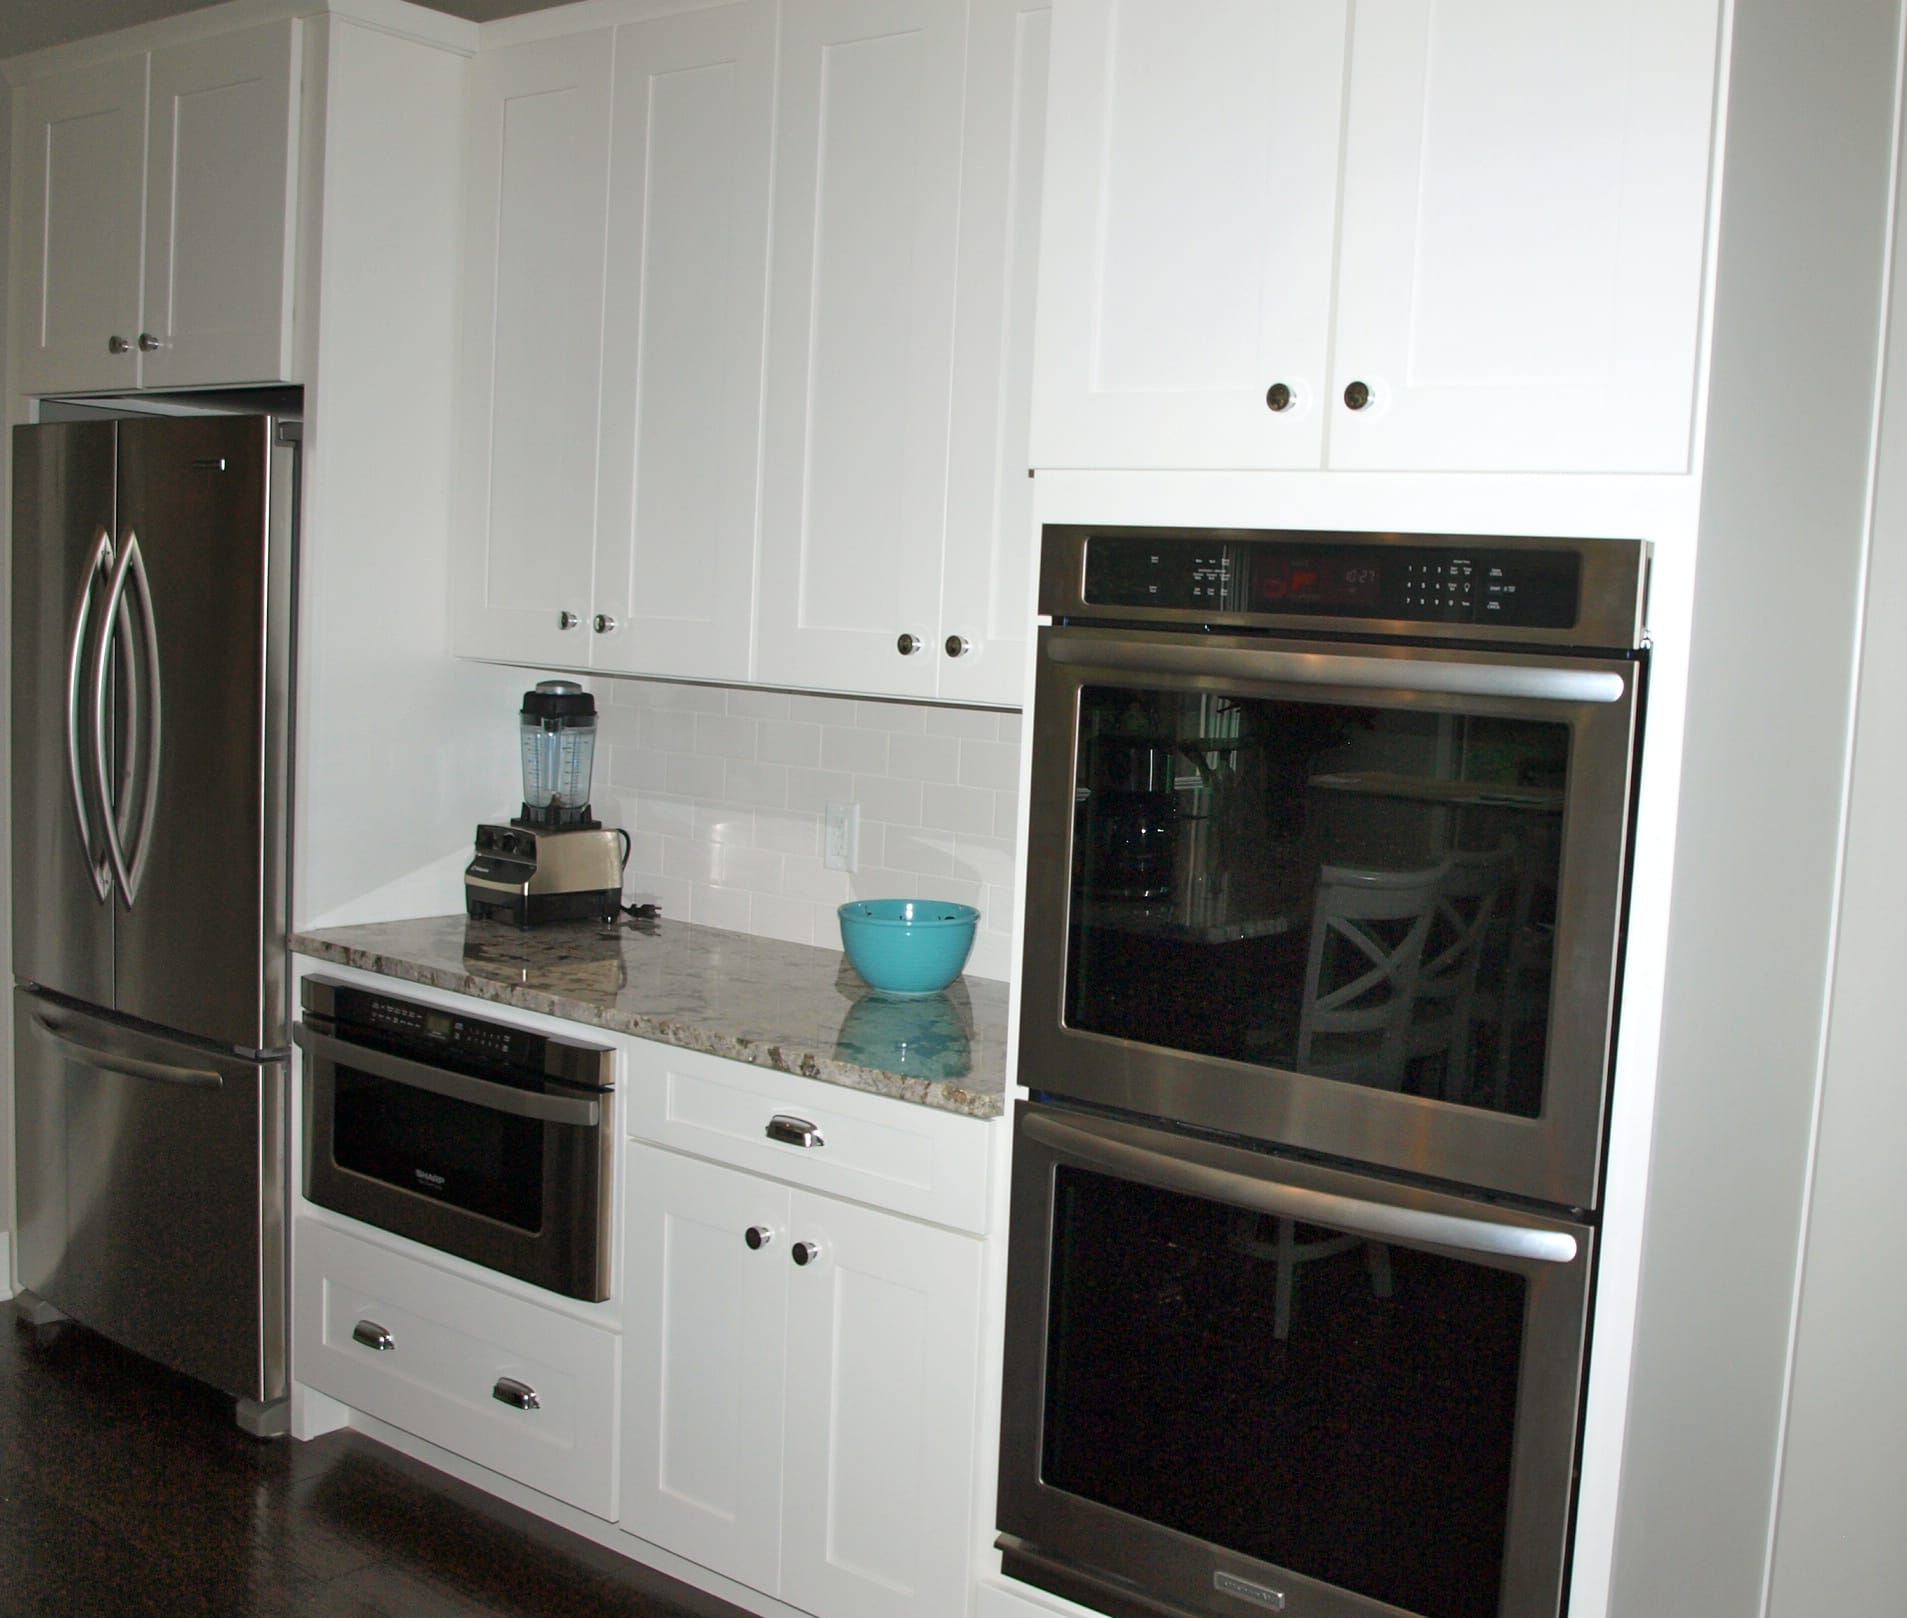 My new house kitchen tour